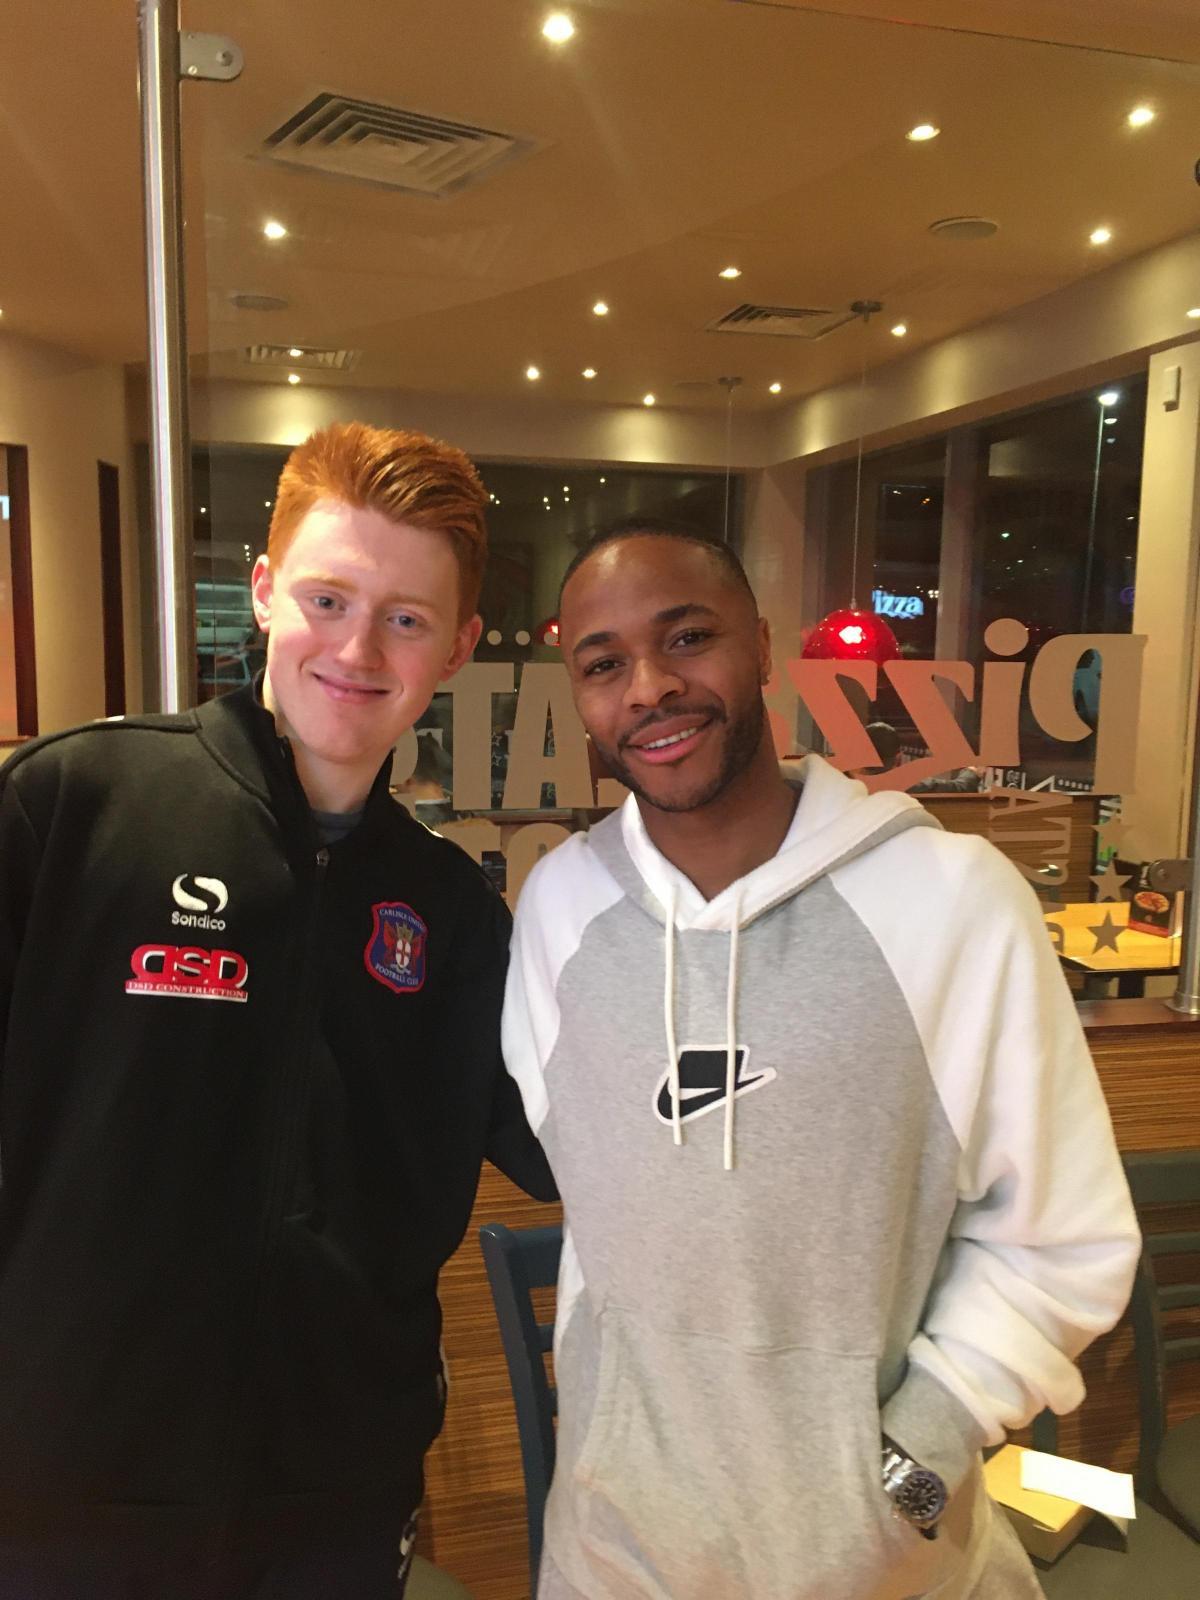 Football Superstar Raheem Sterling Visits Pizza Hut And